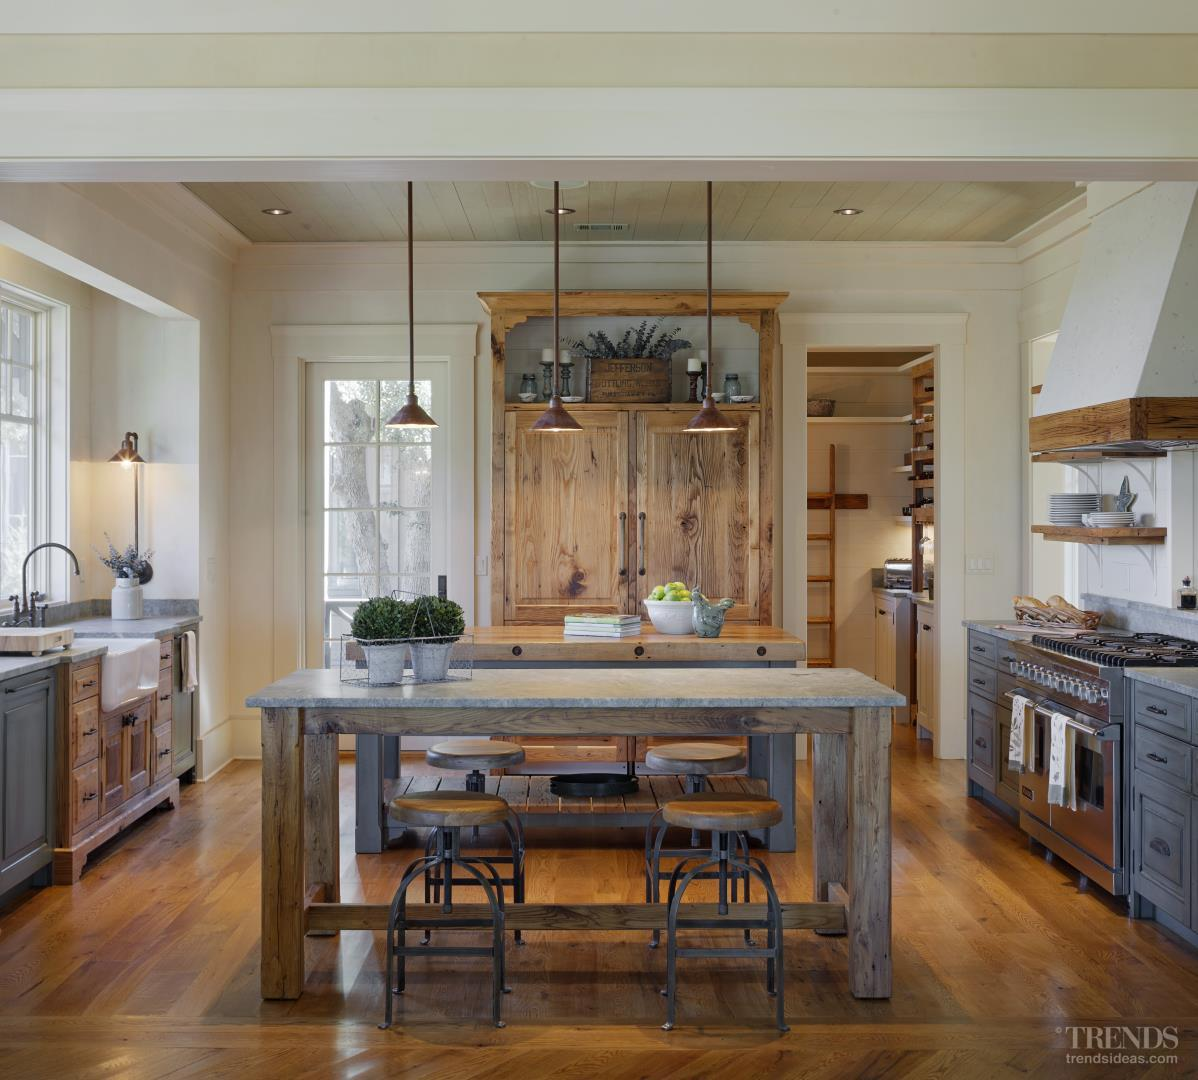 Kitchen Design Articles: Kelley Designs Kitchen Reflects Location